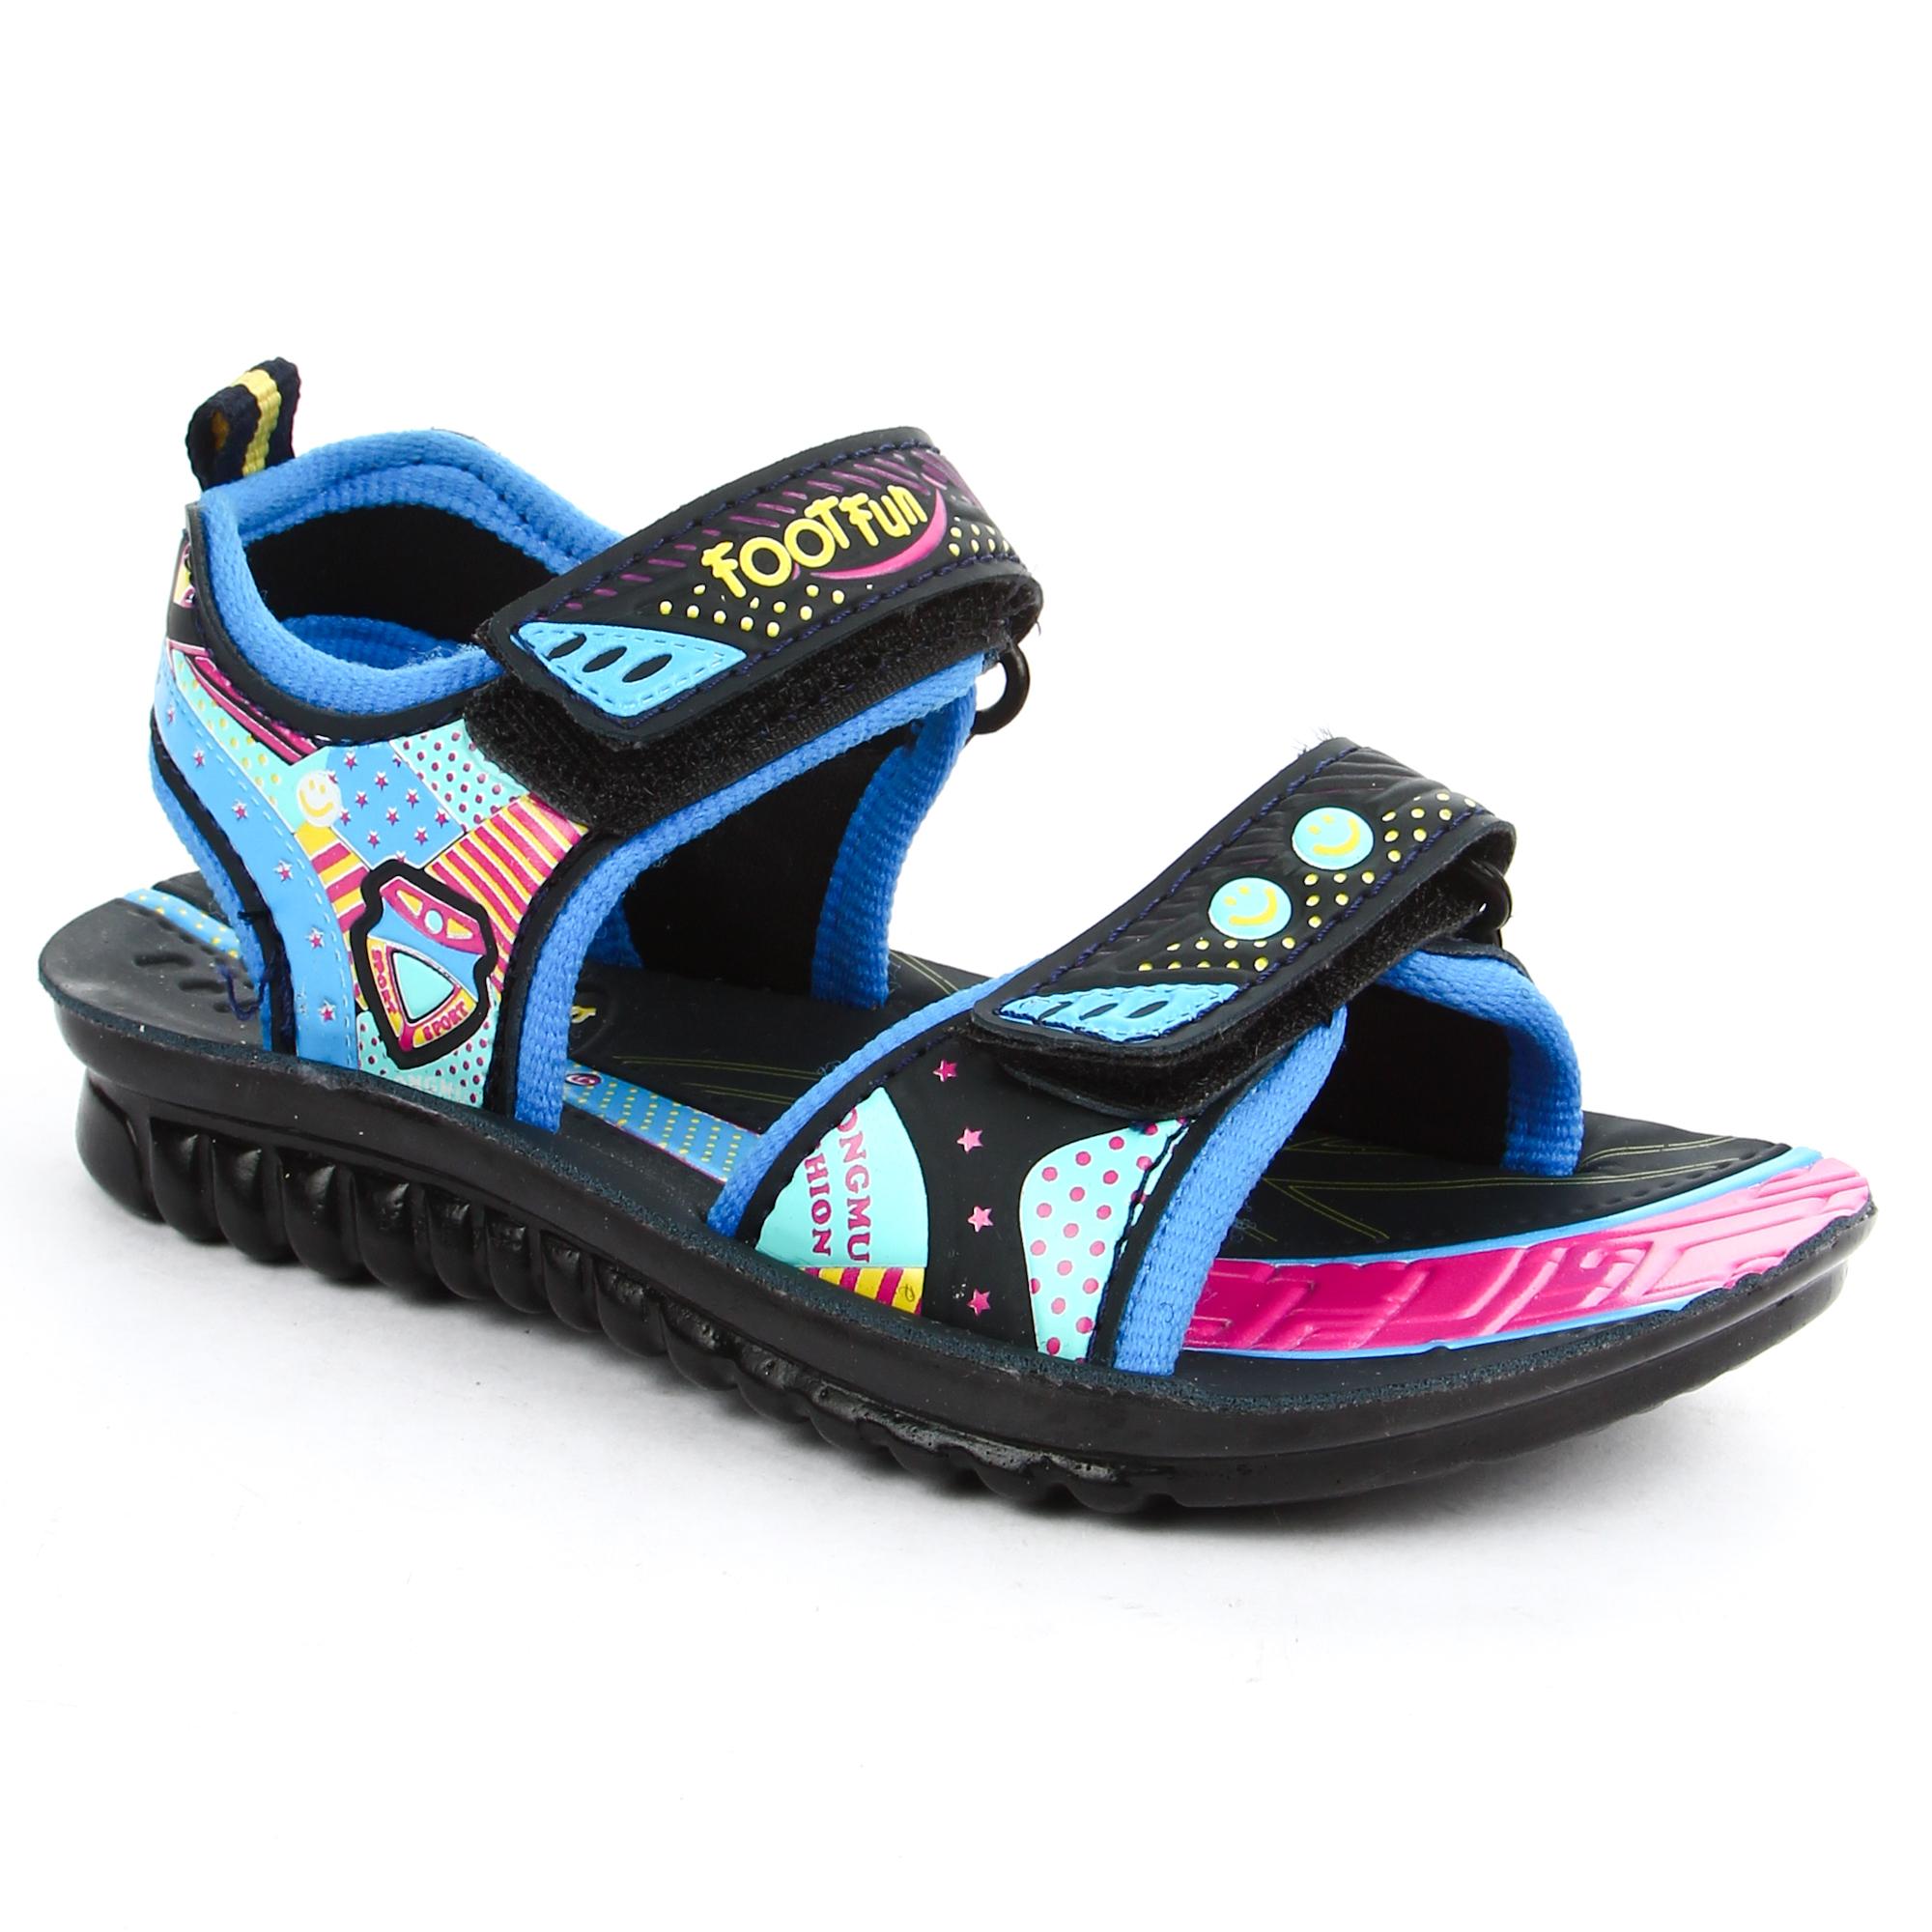 Liberty | Liberty Lucy & Luke Blue Sandals PHANTOM-1 For - Kids